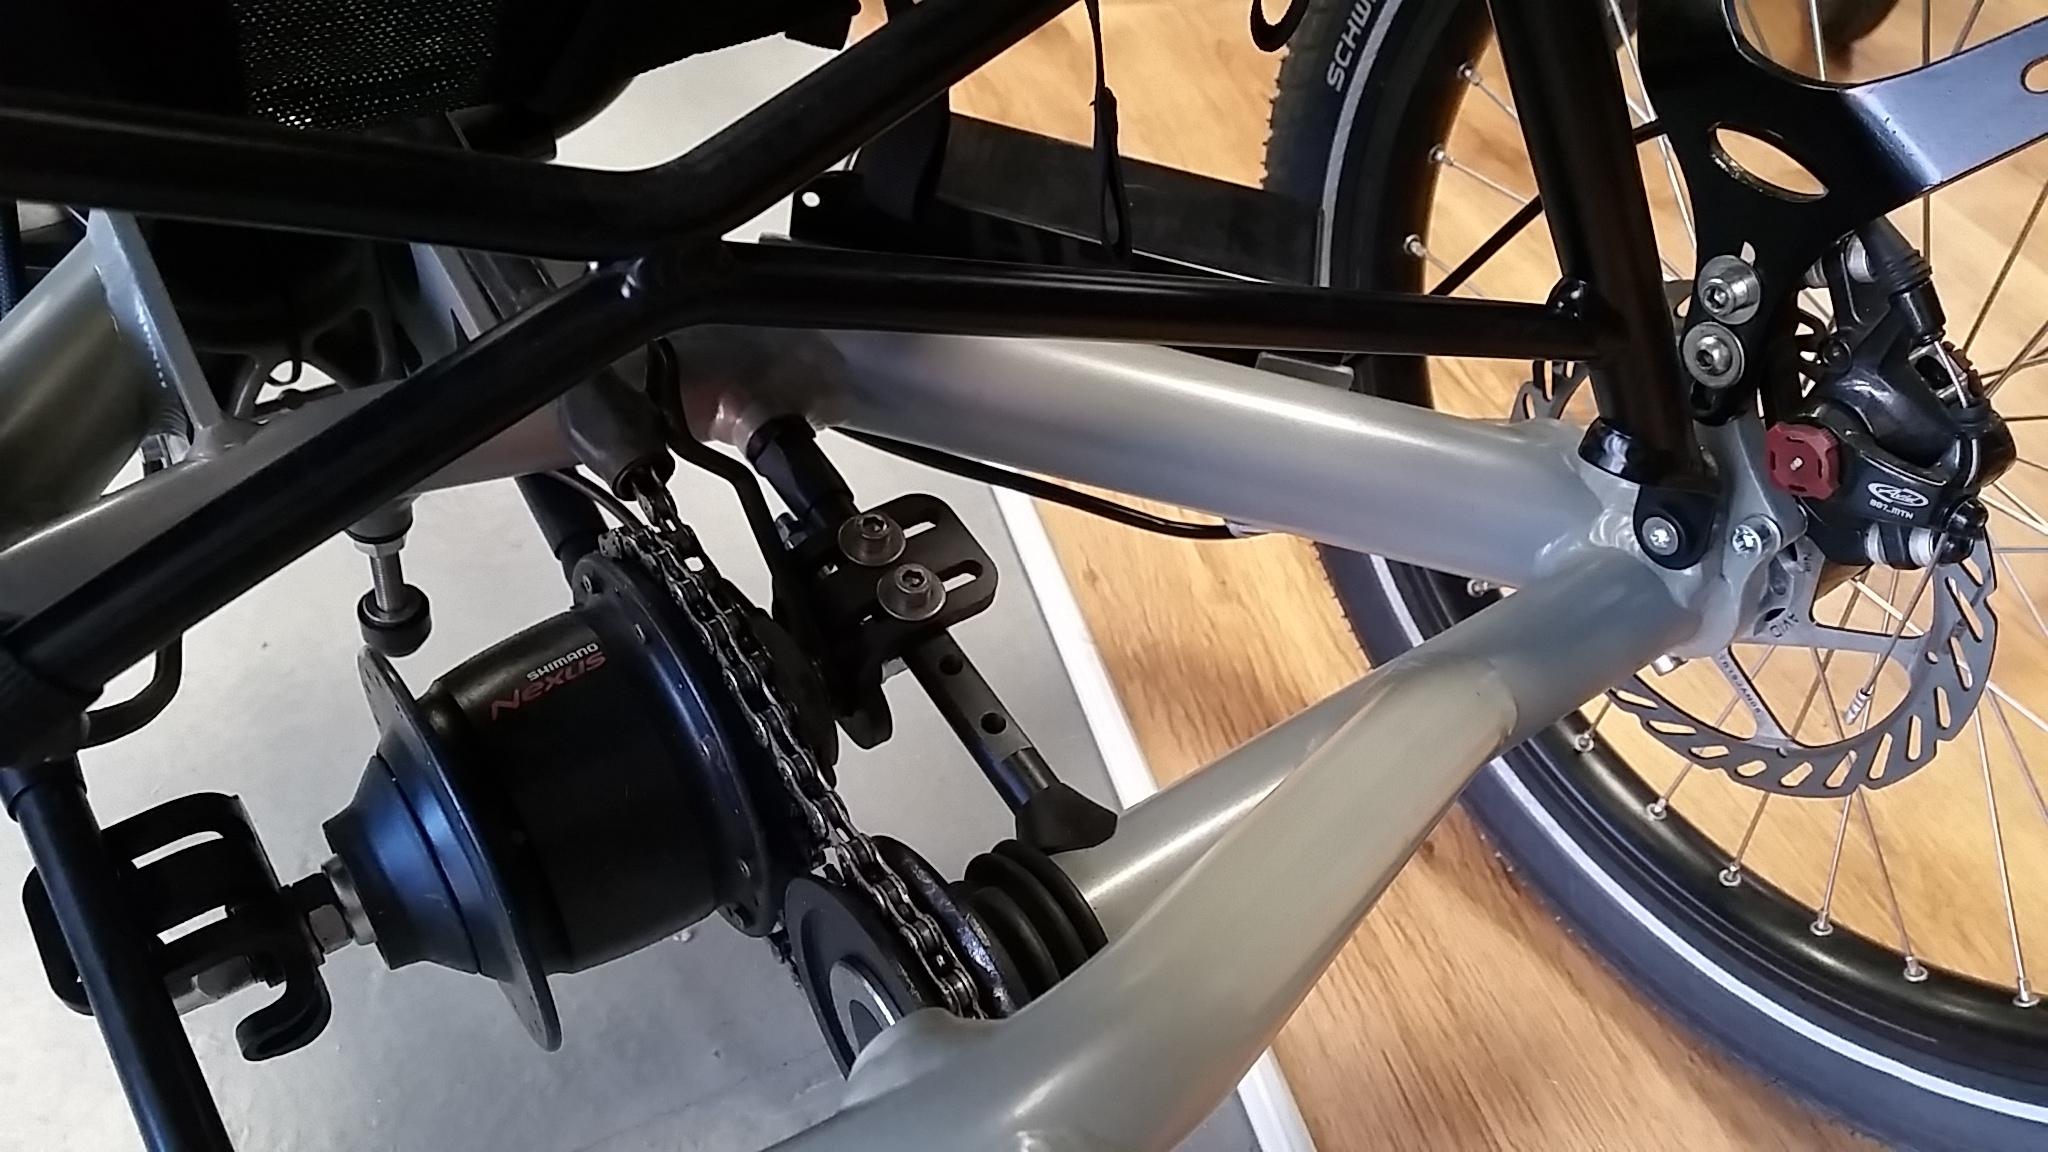 hase-kettwiesel-e-trike-reha-dreirad-2020-gebraucht-nhe-hamburg.jpg